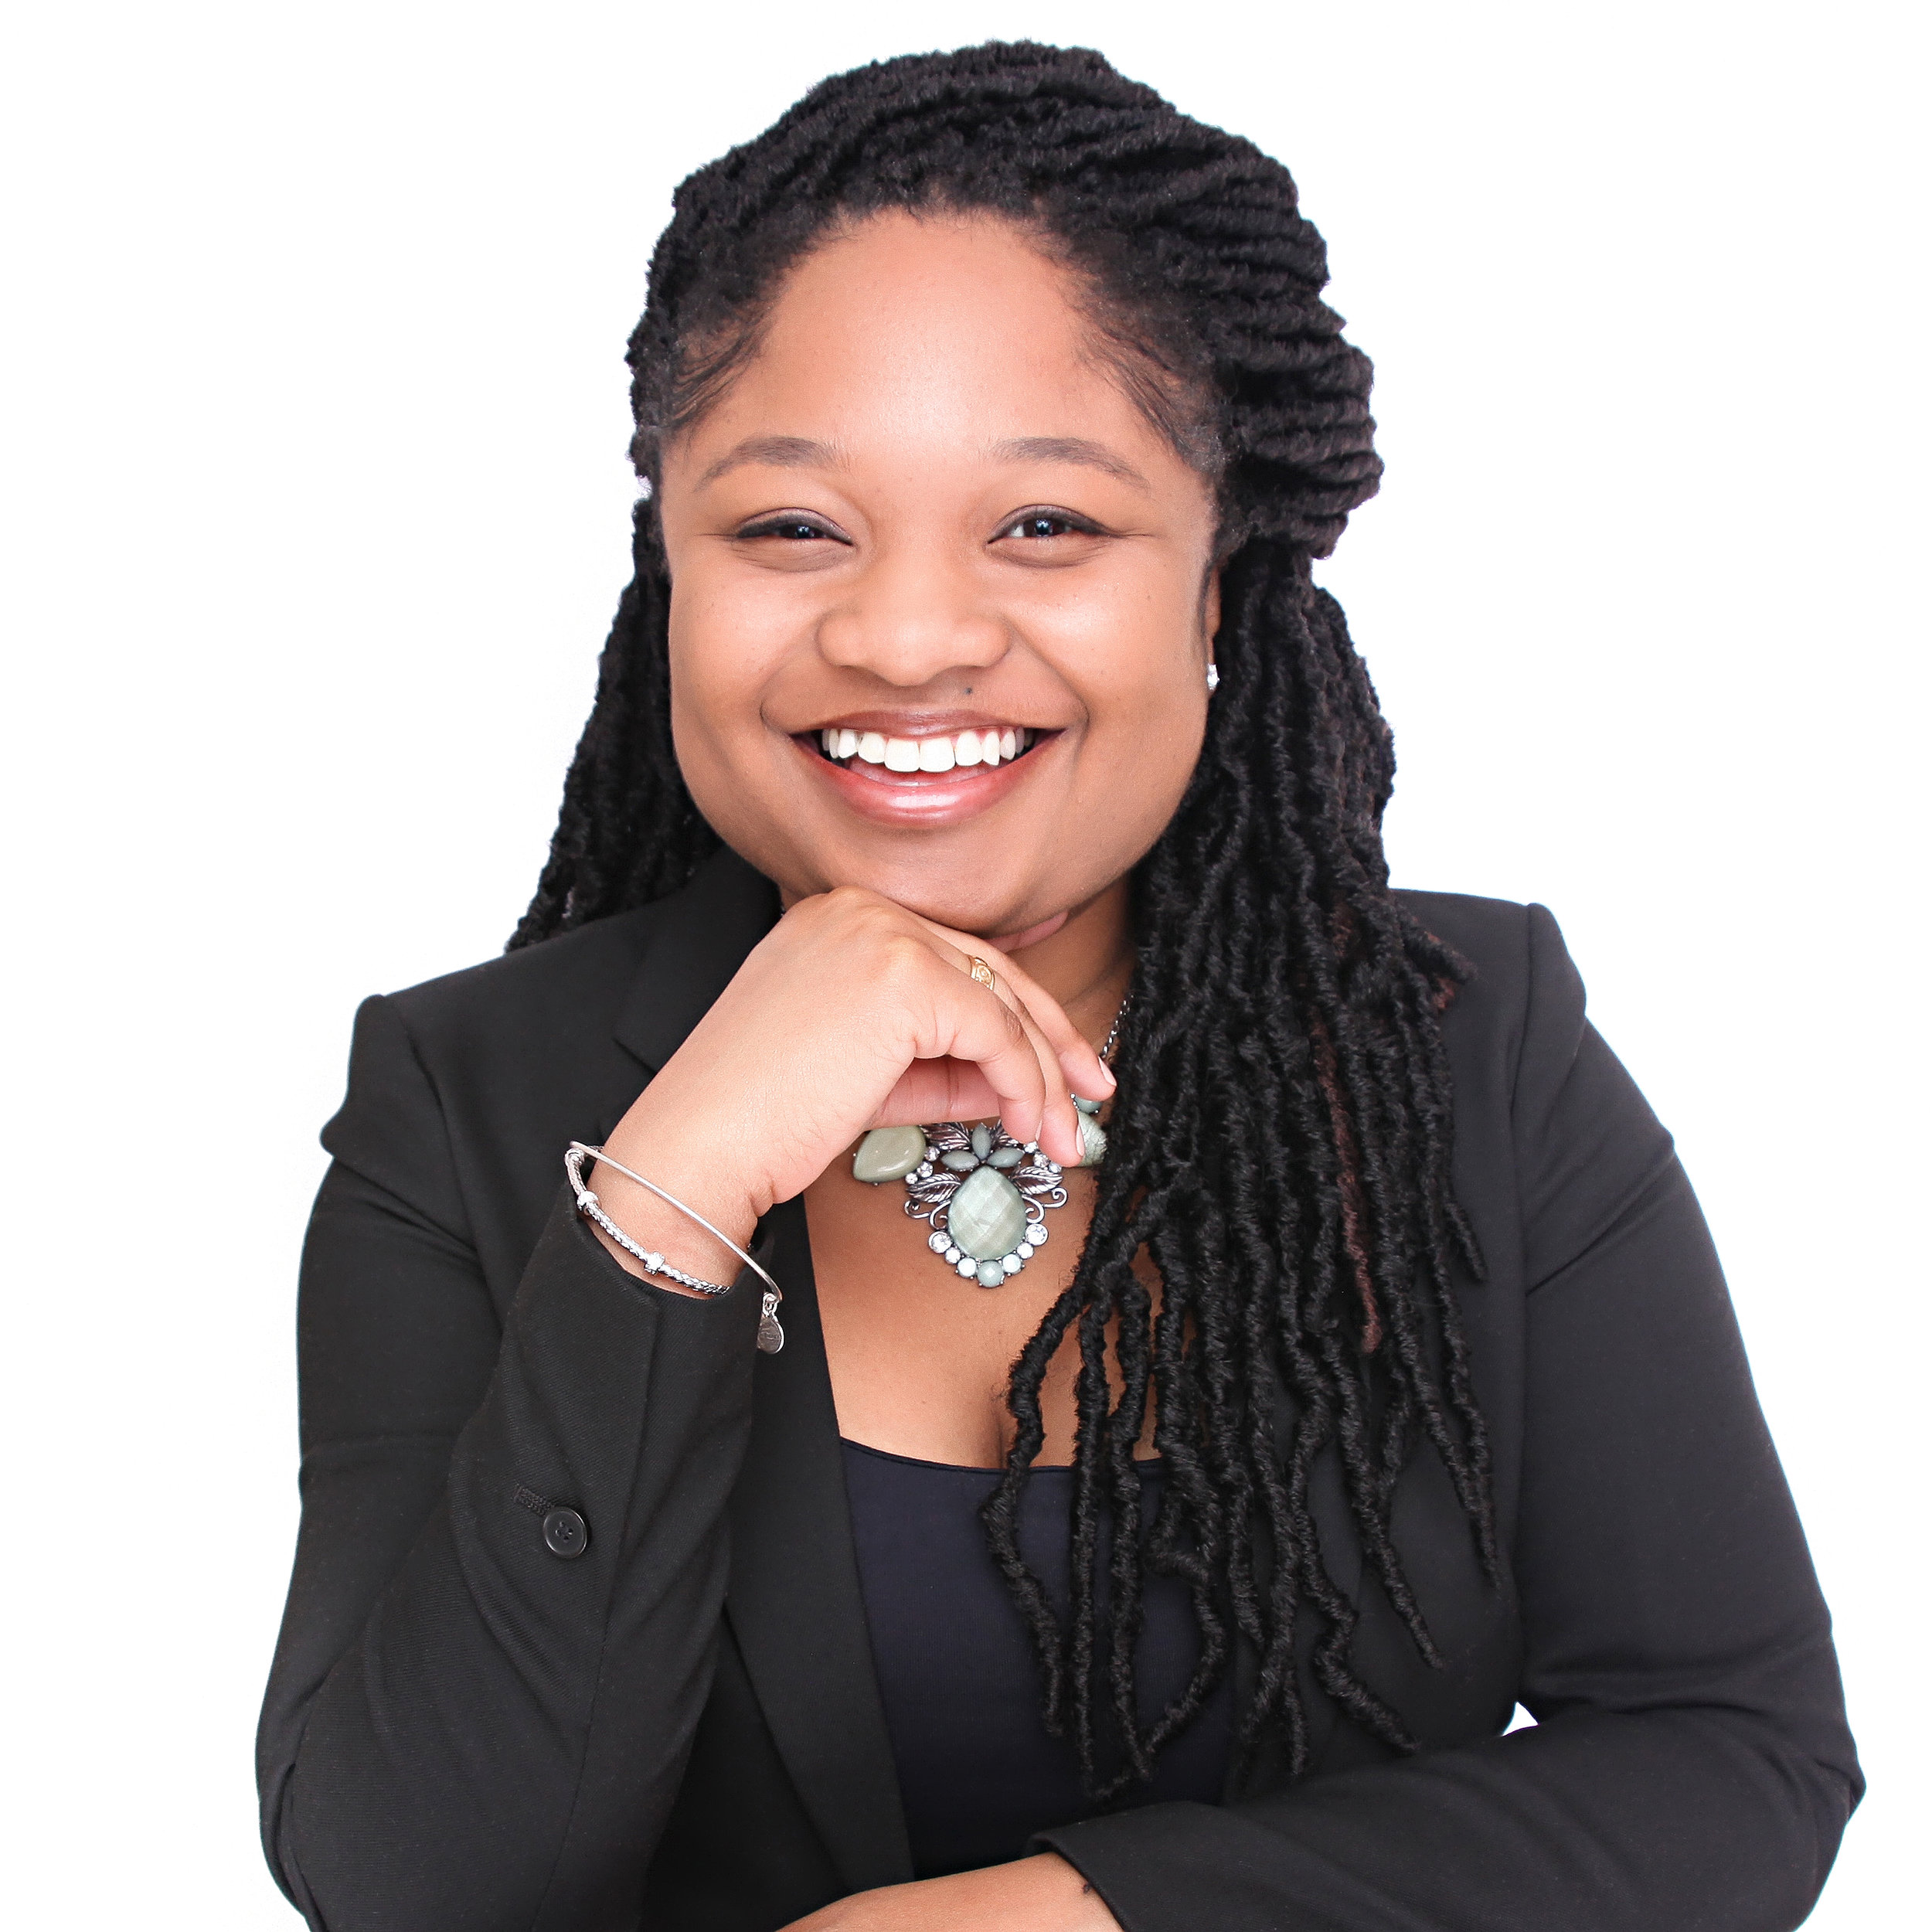 Meet Amaris Watson Gale - Founder, Premarital Therapist + Emotional Wellness Educator